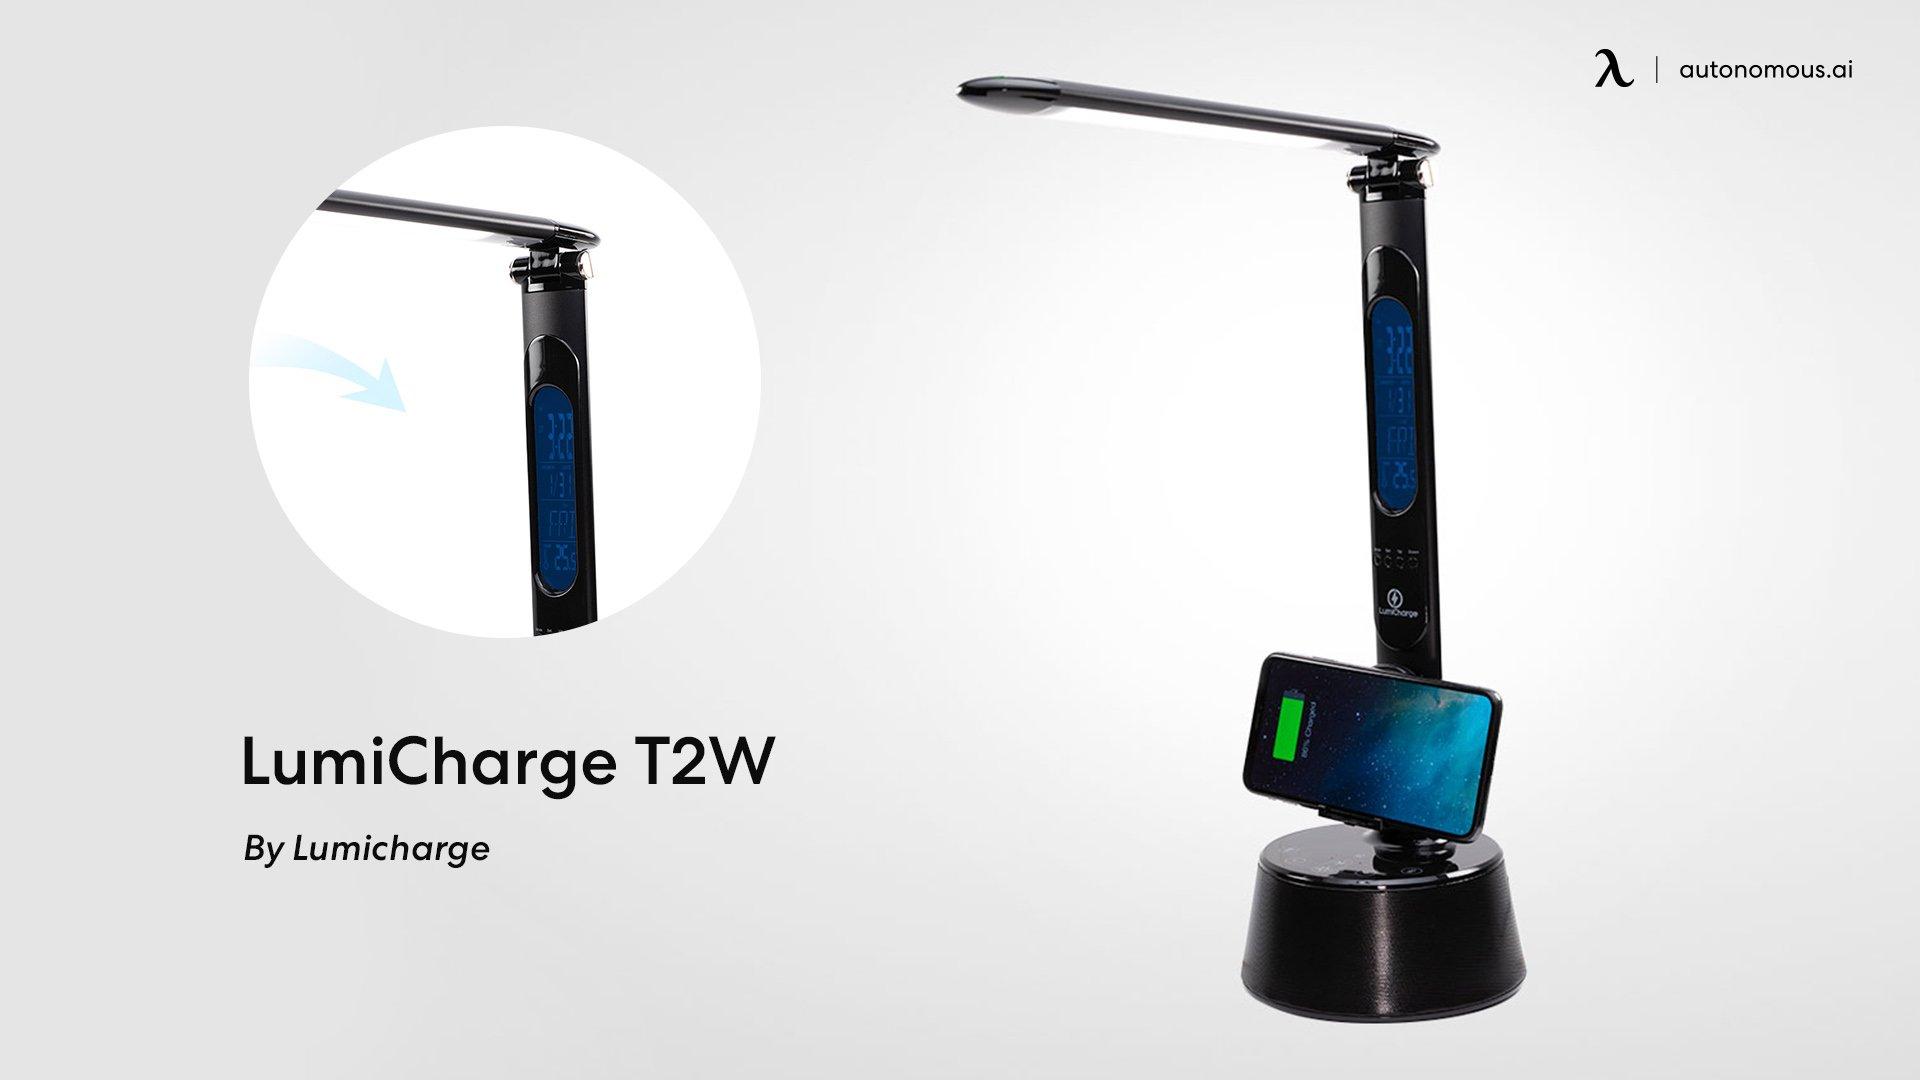 Lumi Charge T2W